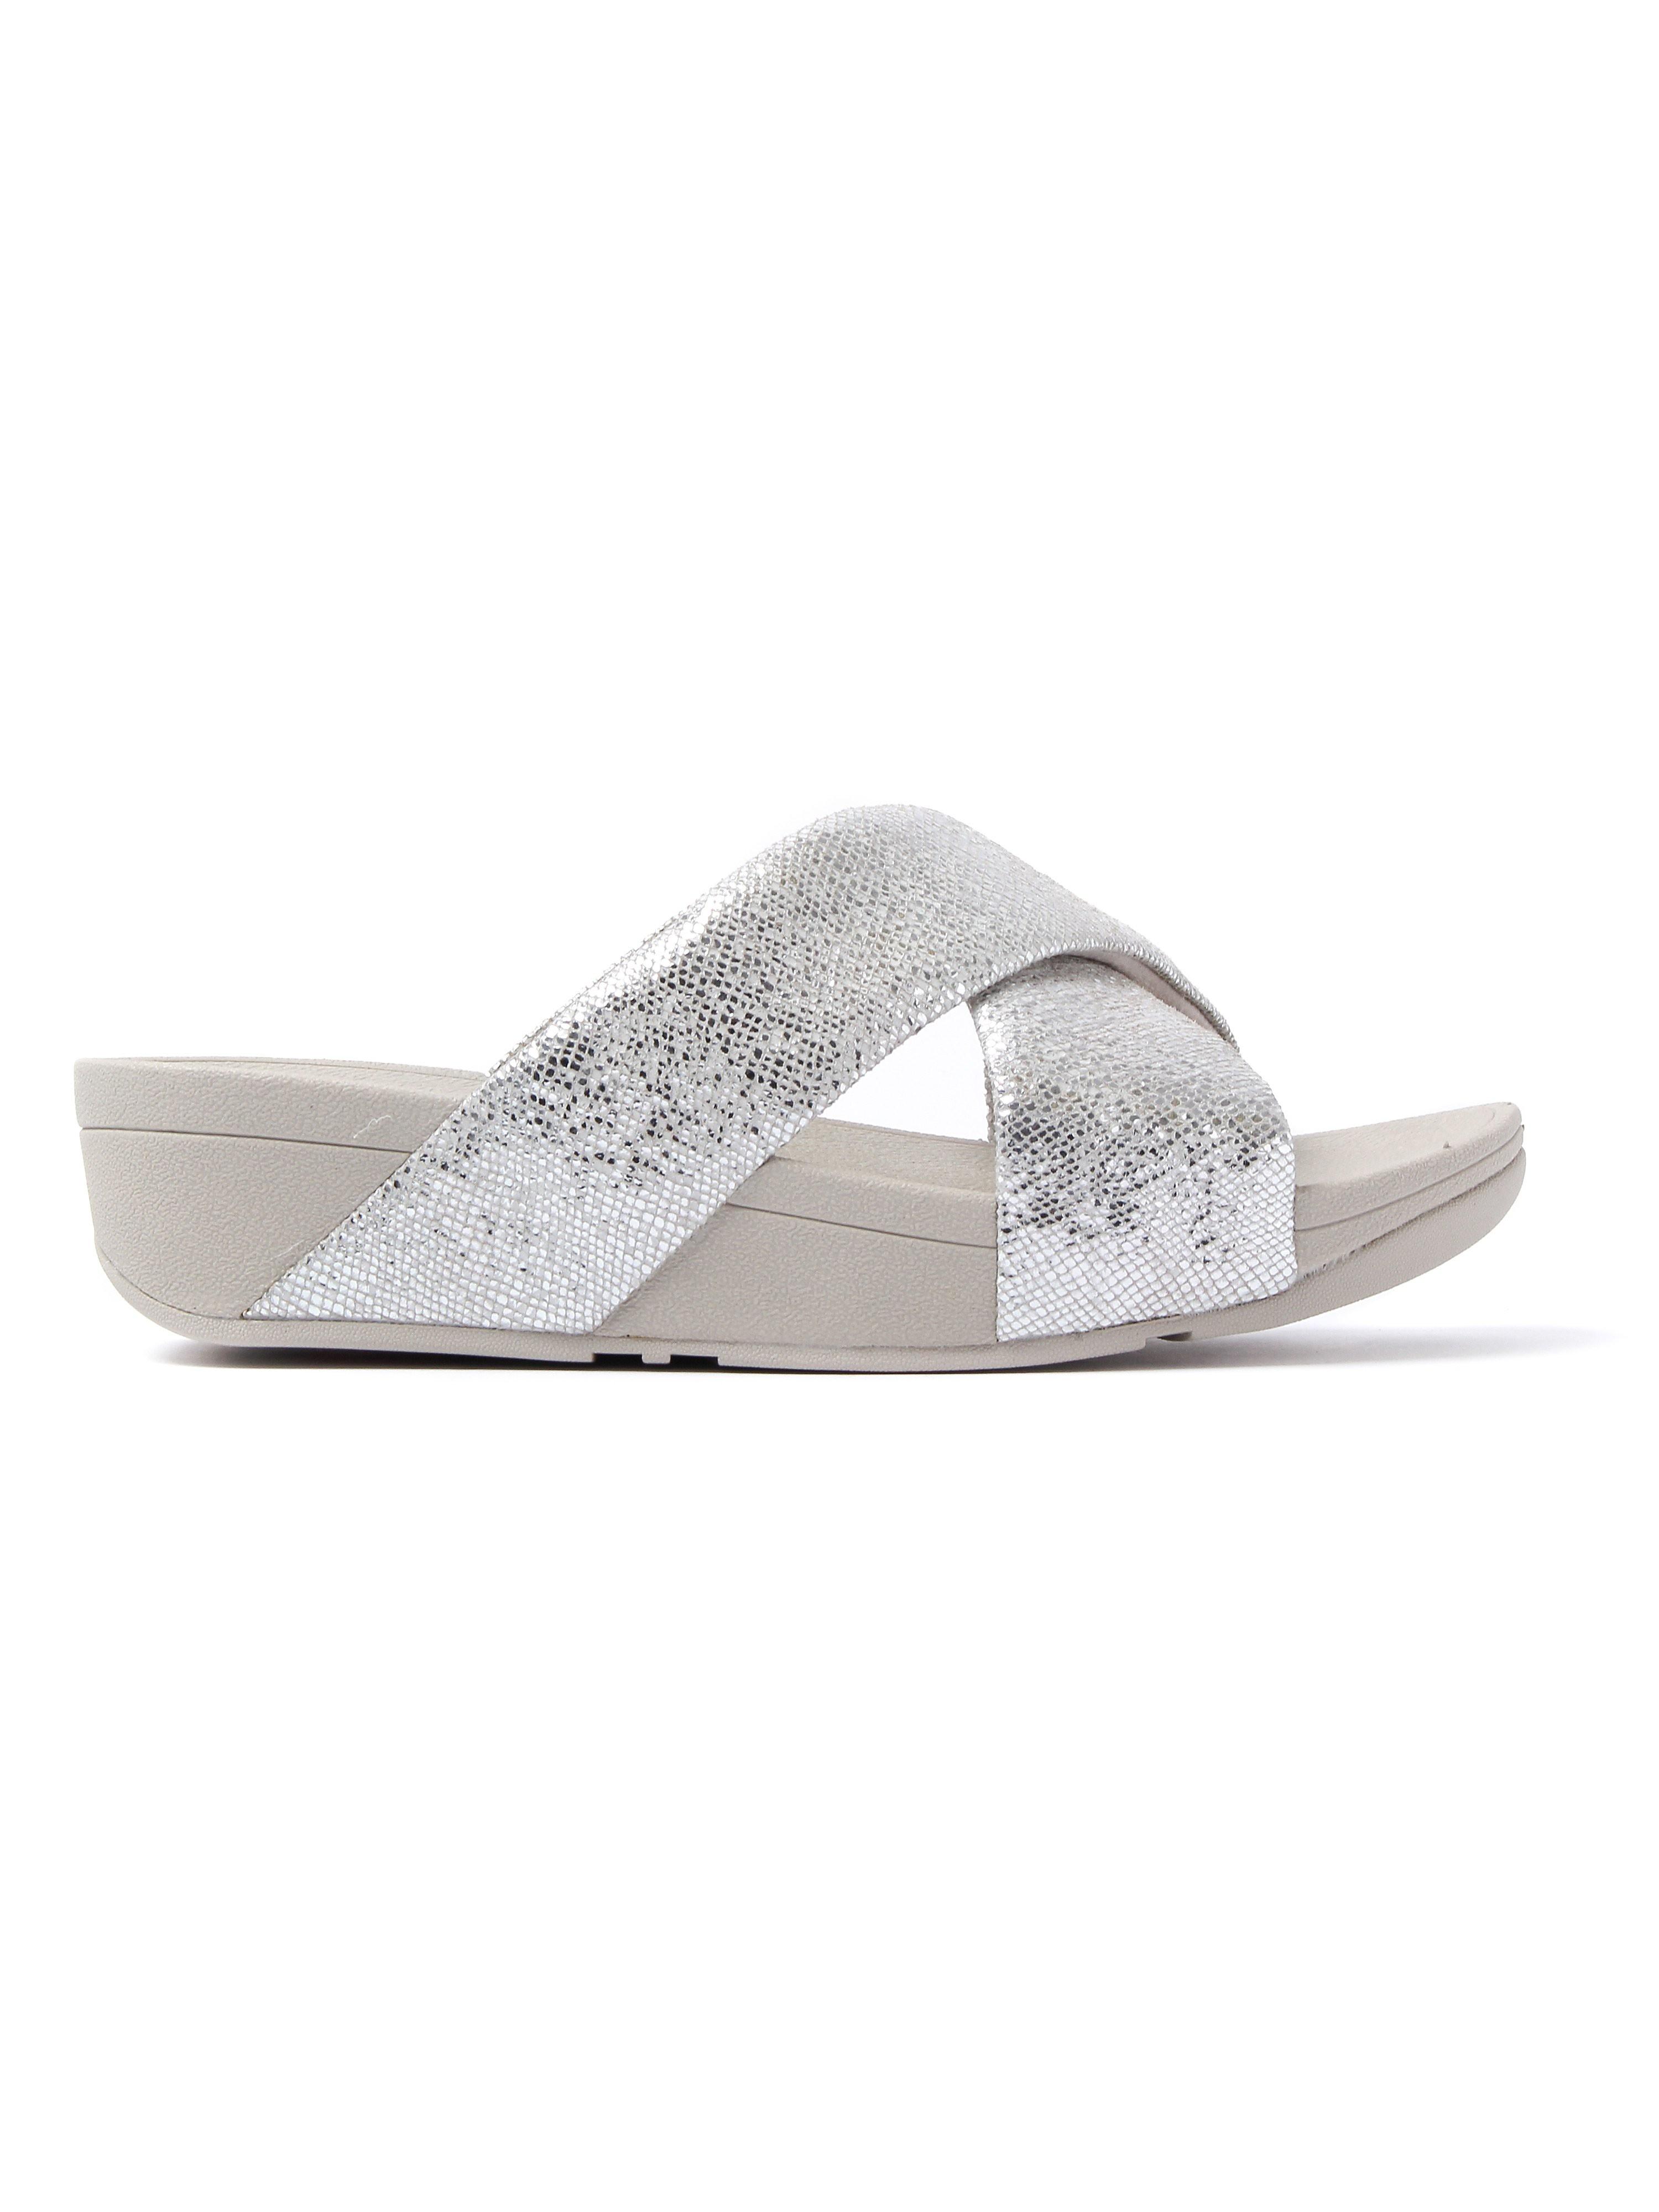 FitFlop Women's Swoop Slide Sandals - Silver